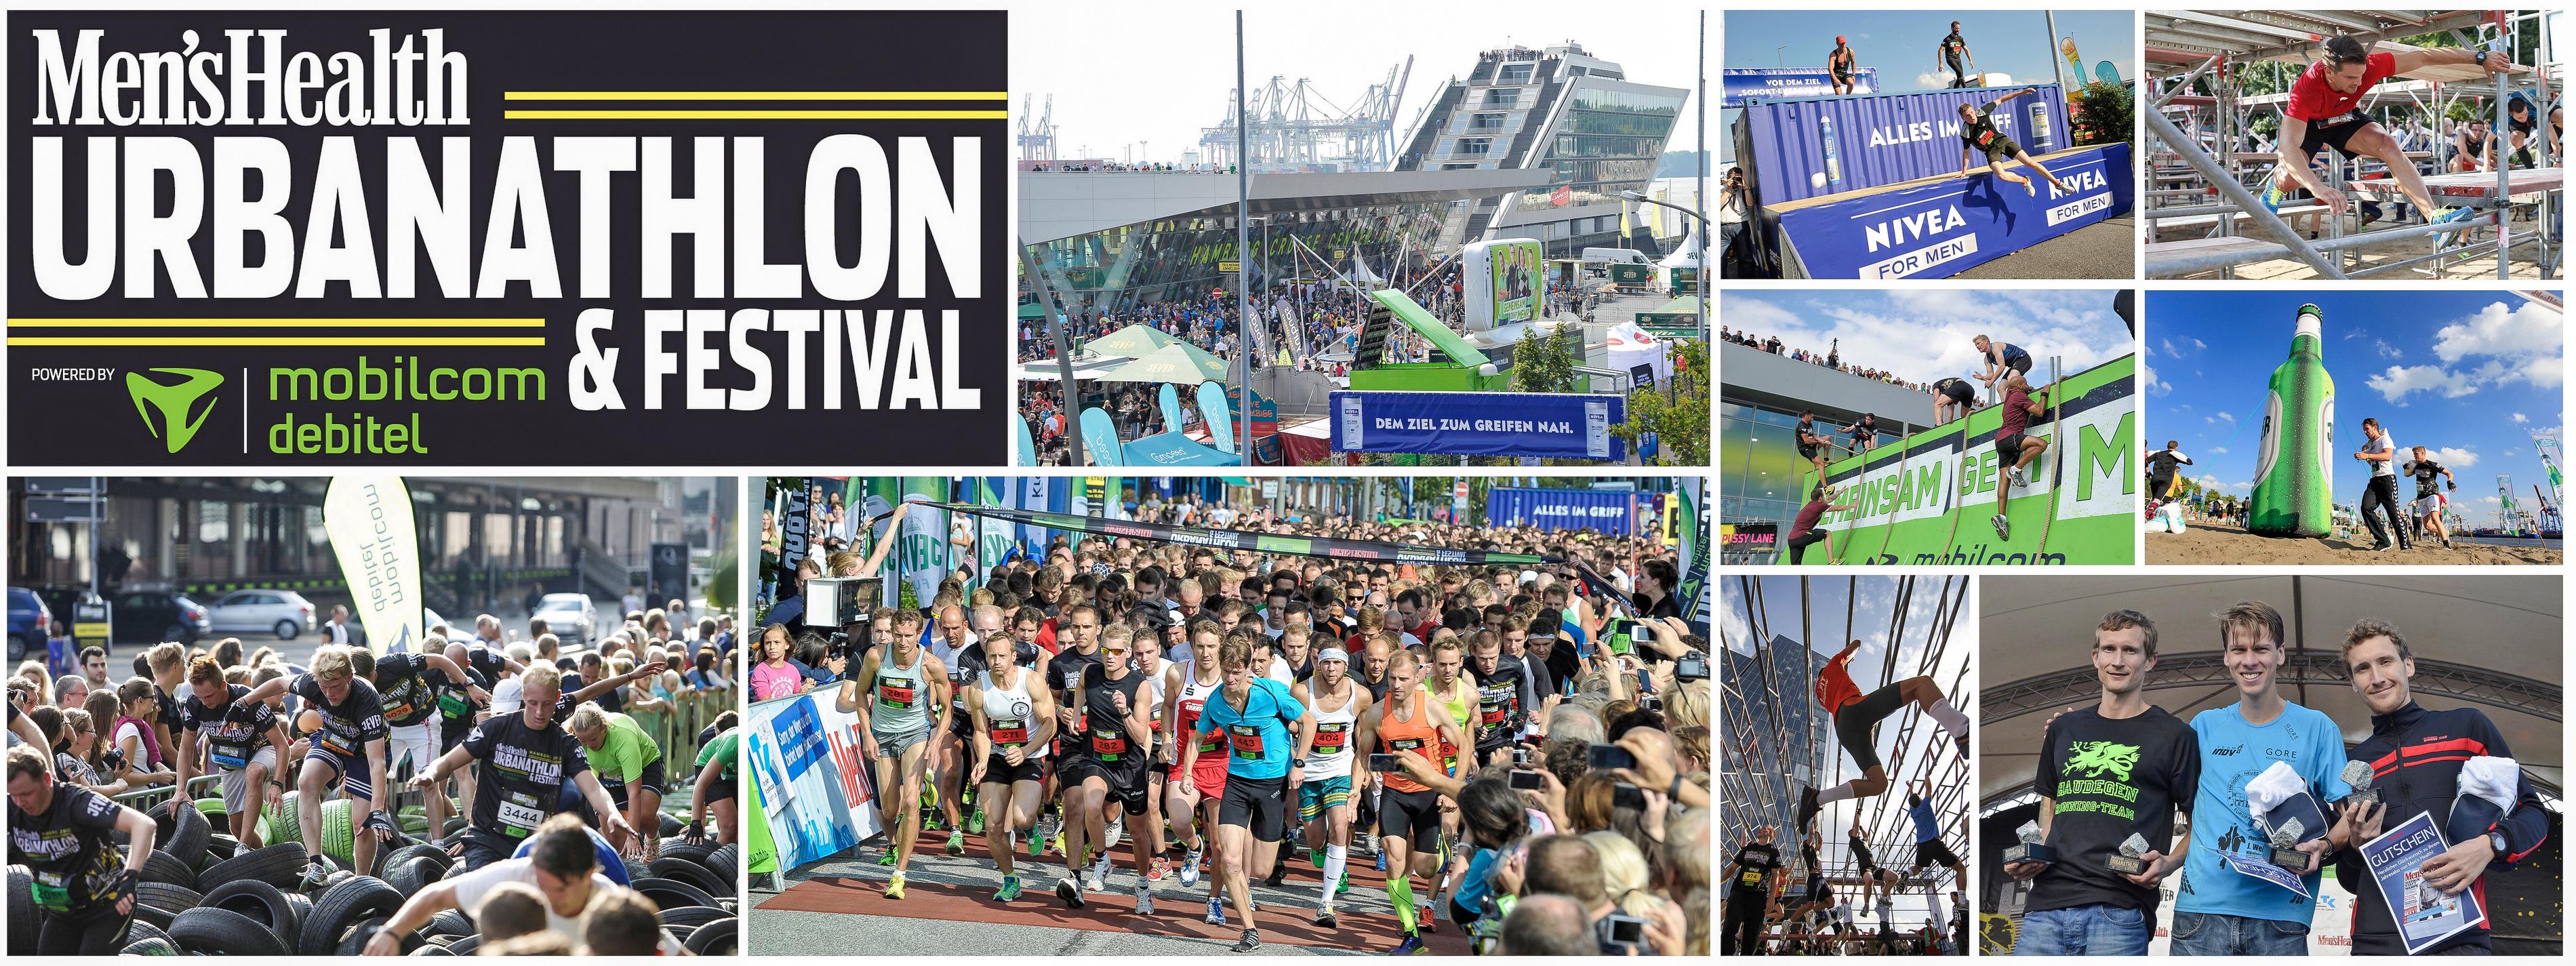 urbanathlon-urbathlon-hamburg-waterkant-festival-mens-health-lauf-marathon-halbmarathon-hh-bericht-blog-blogger-treppen-bone-braker-bonebreaker-12-24-strecke-fotos-bilder-alf-dahl